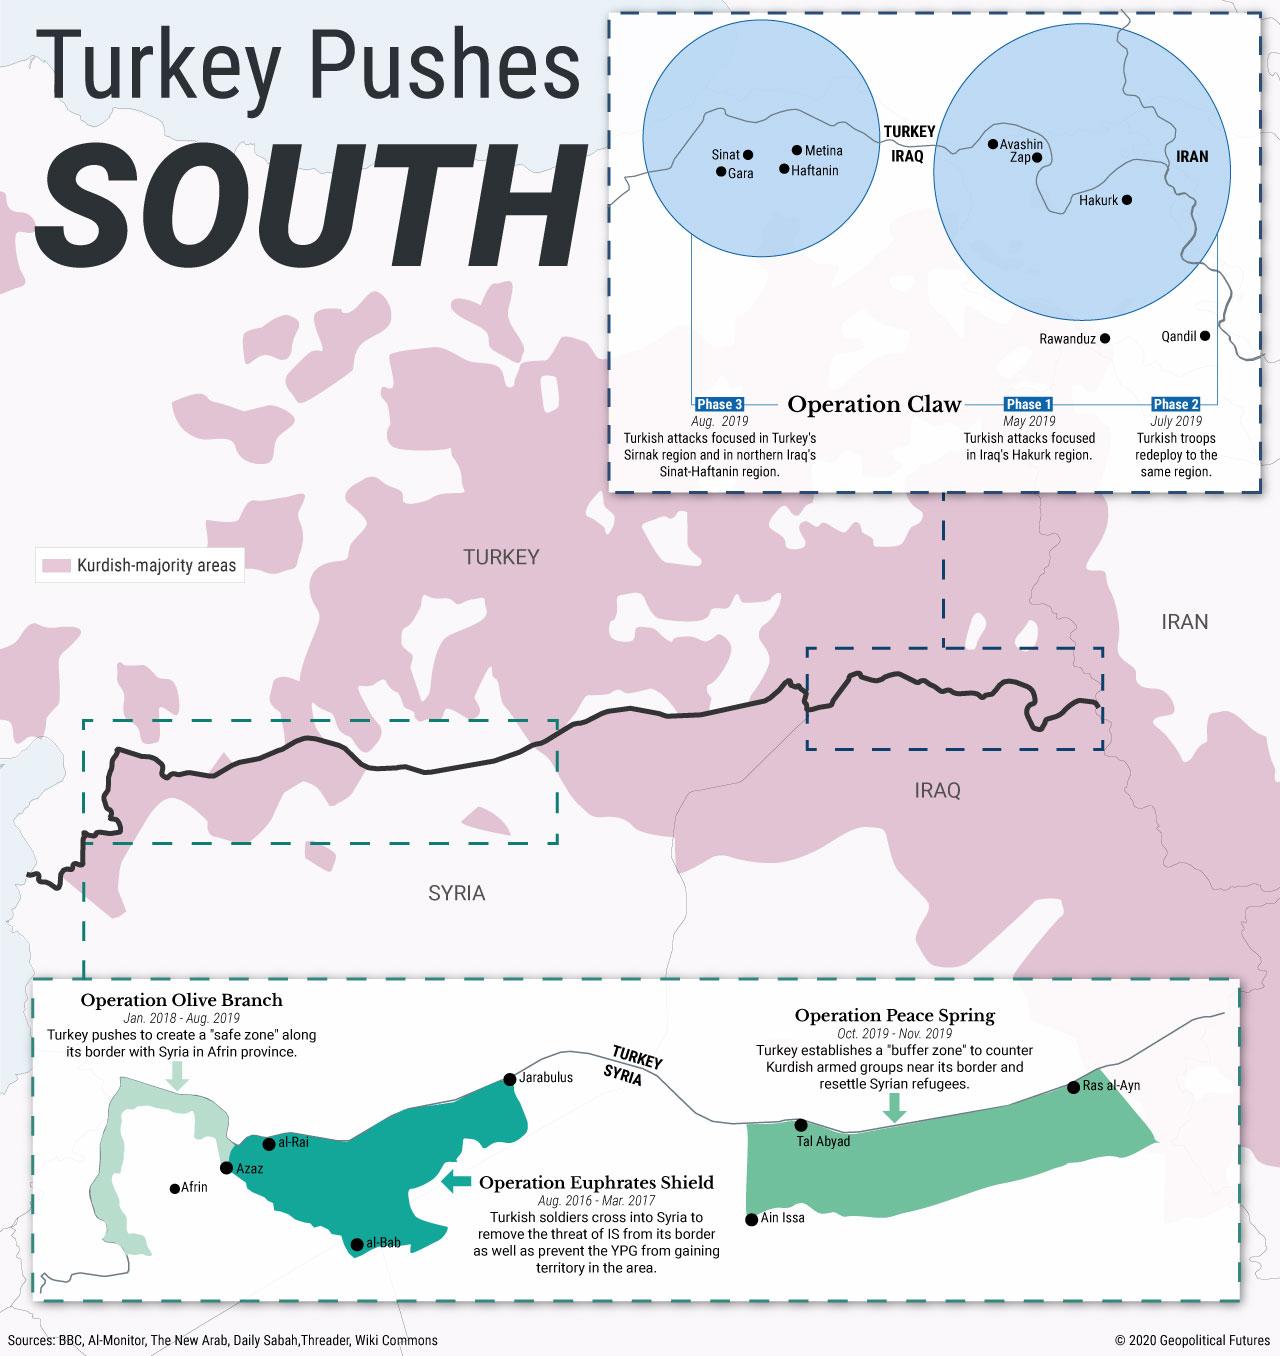 Turkey Pushes South